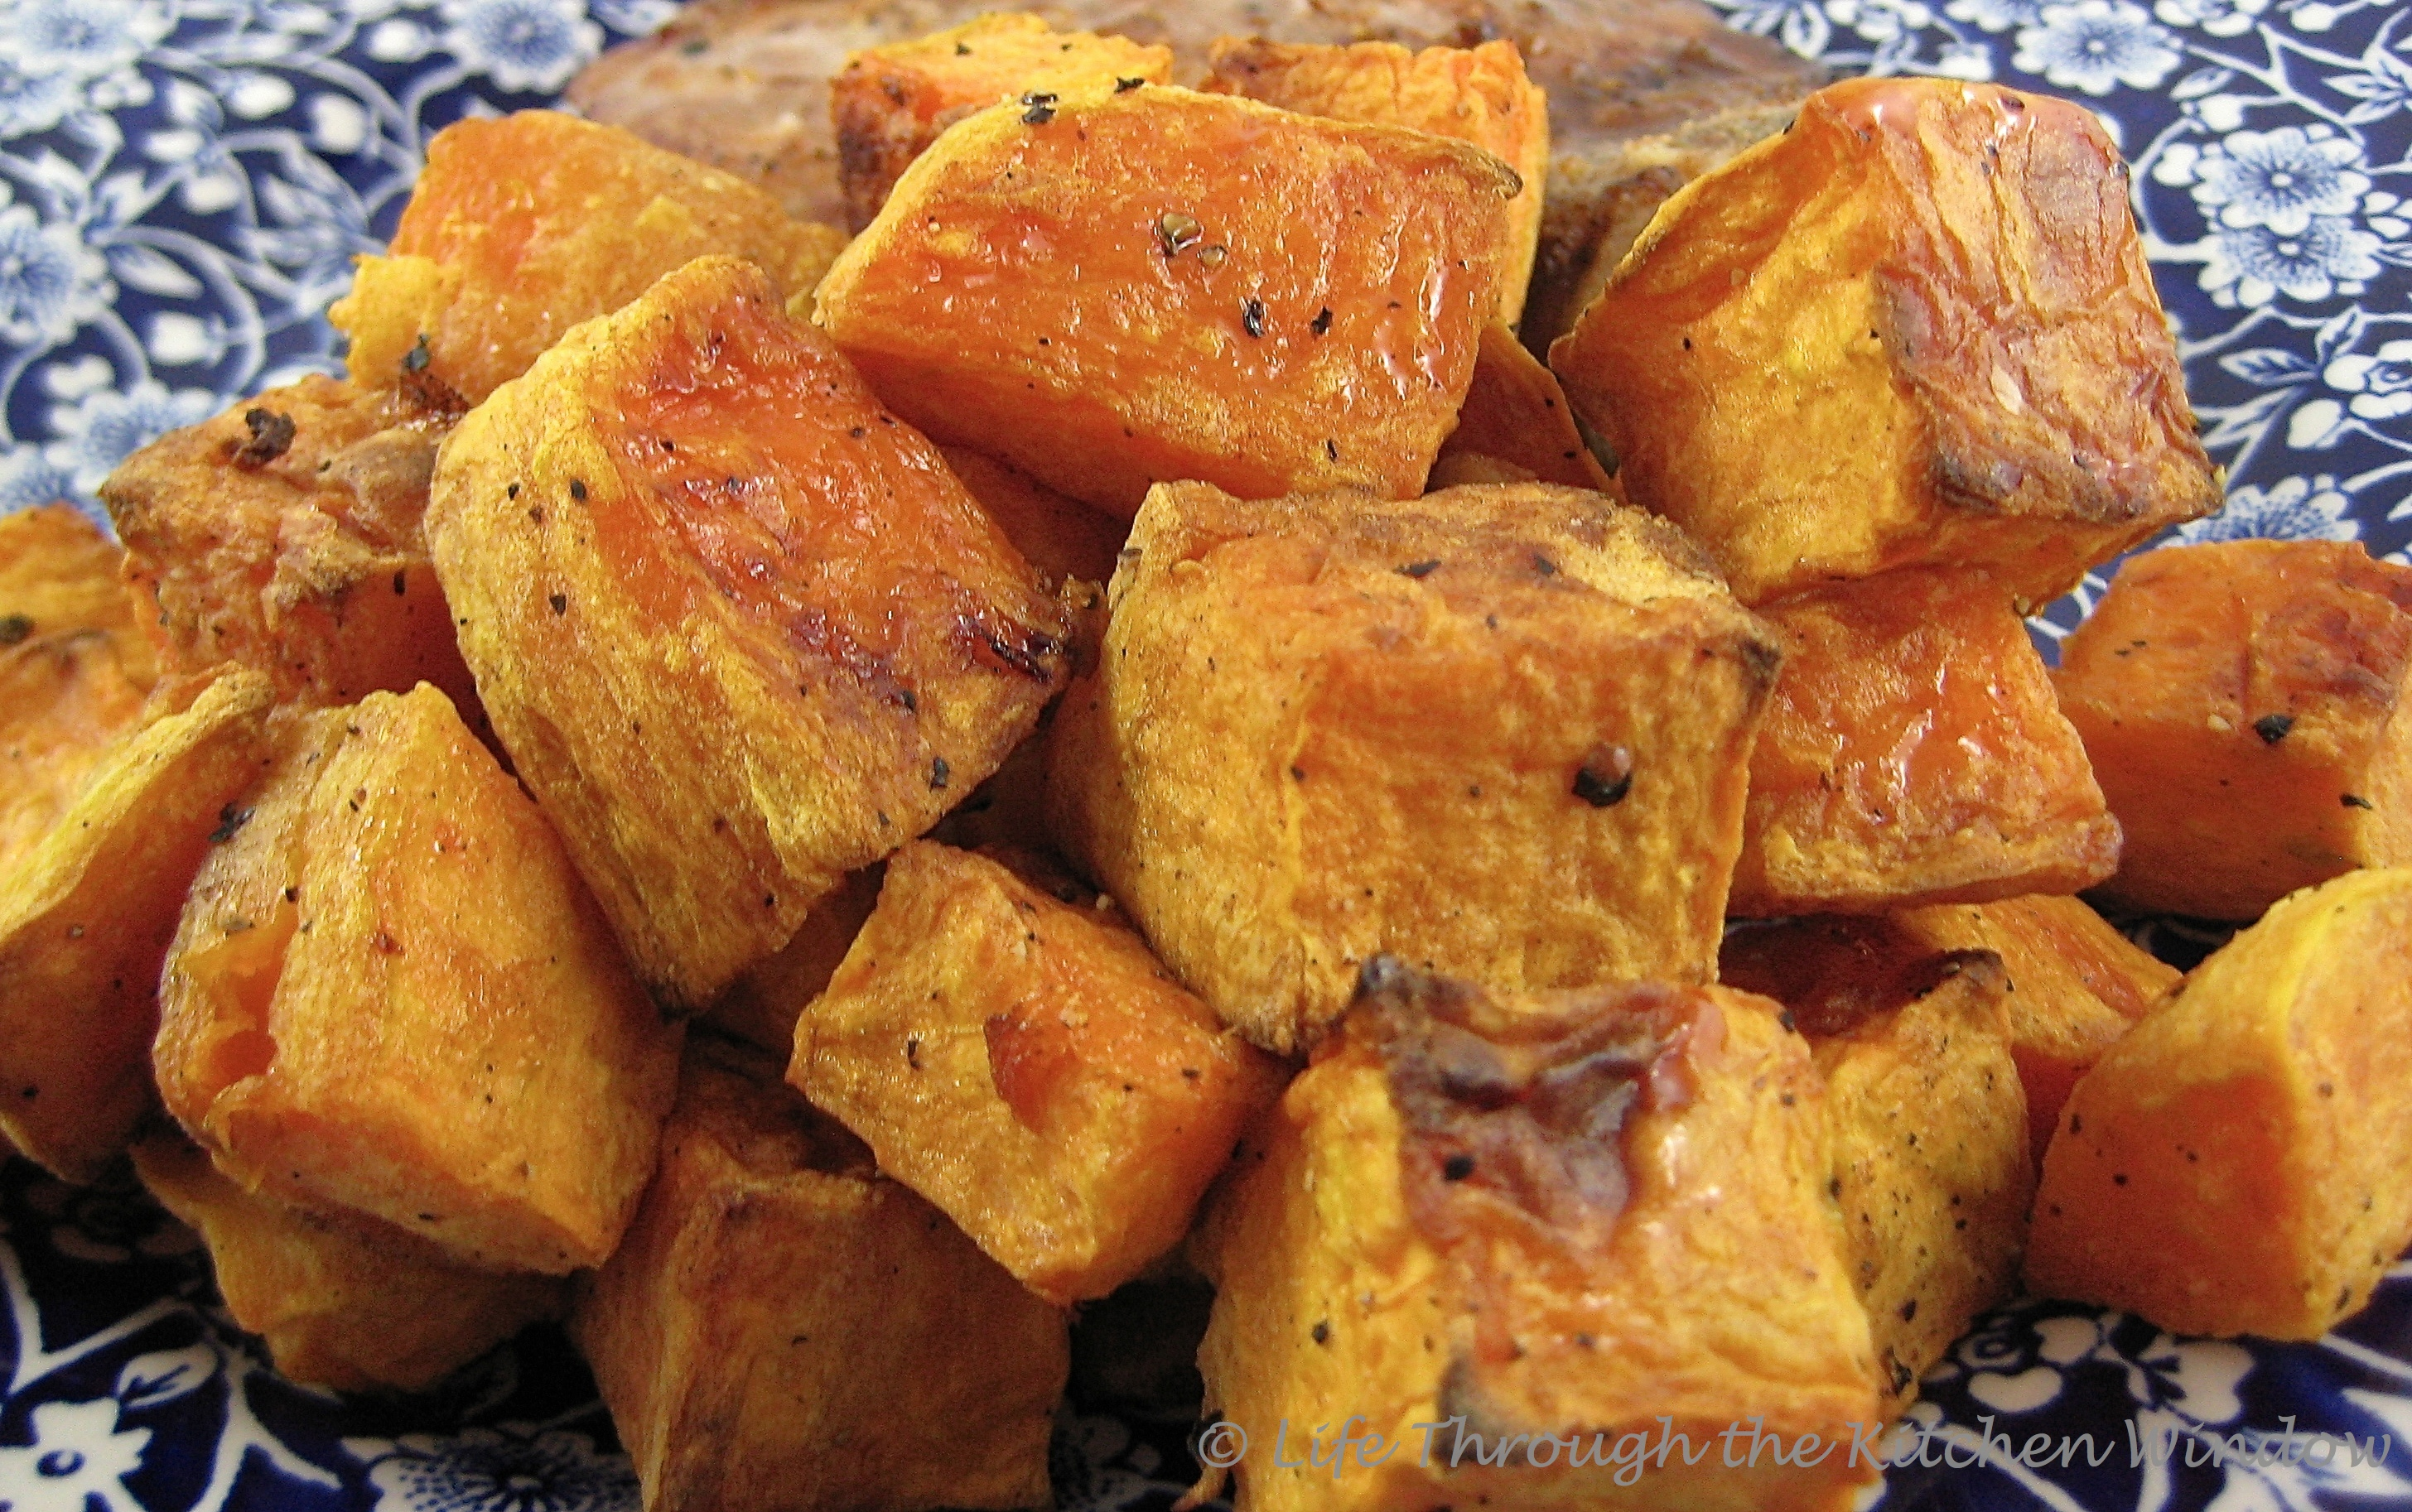 Caramelized & Luscious Roasted Sweet Potato | © Life Through the Kitchen Window.com